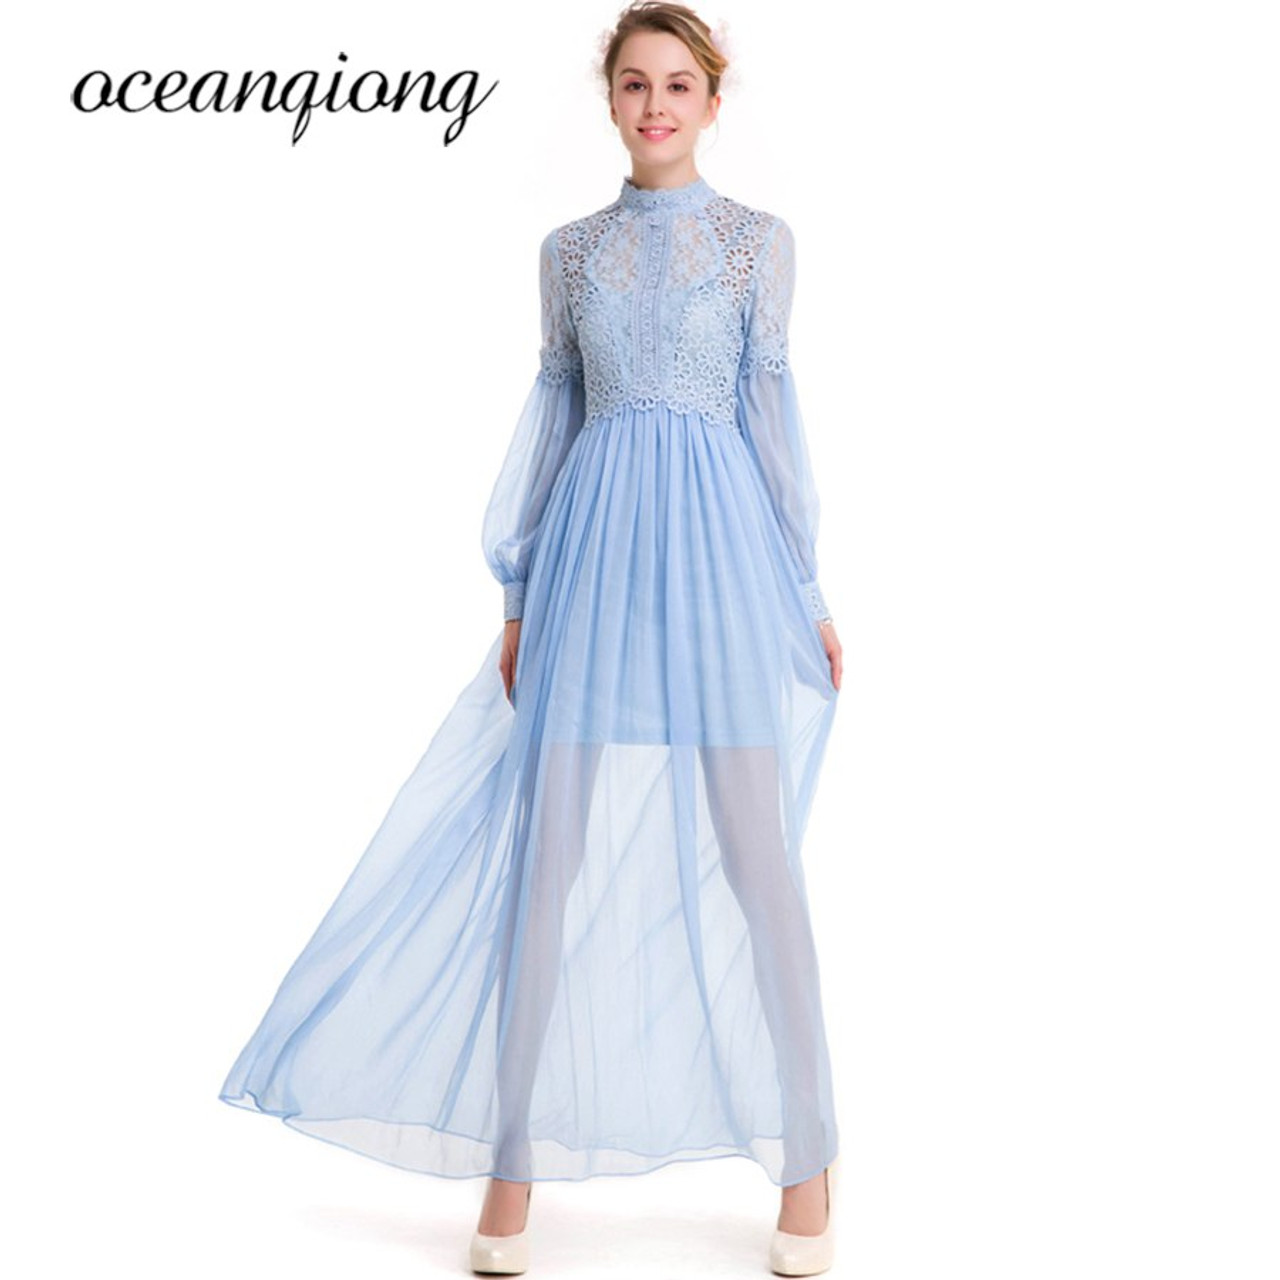 7ea3a1fab0c8b Women Dress Chiffon Sexy Lace Dress Summer 2018 Long Sleeve Lantern Sleeve  Two Piece Chiffon Long Dress Maxi Vestido Plus Size